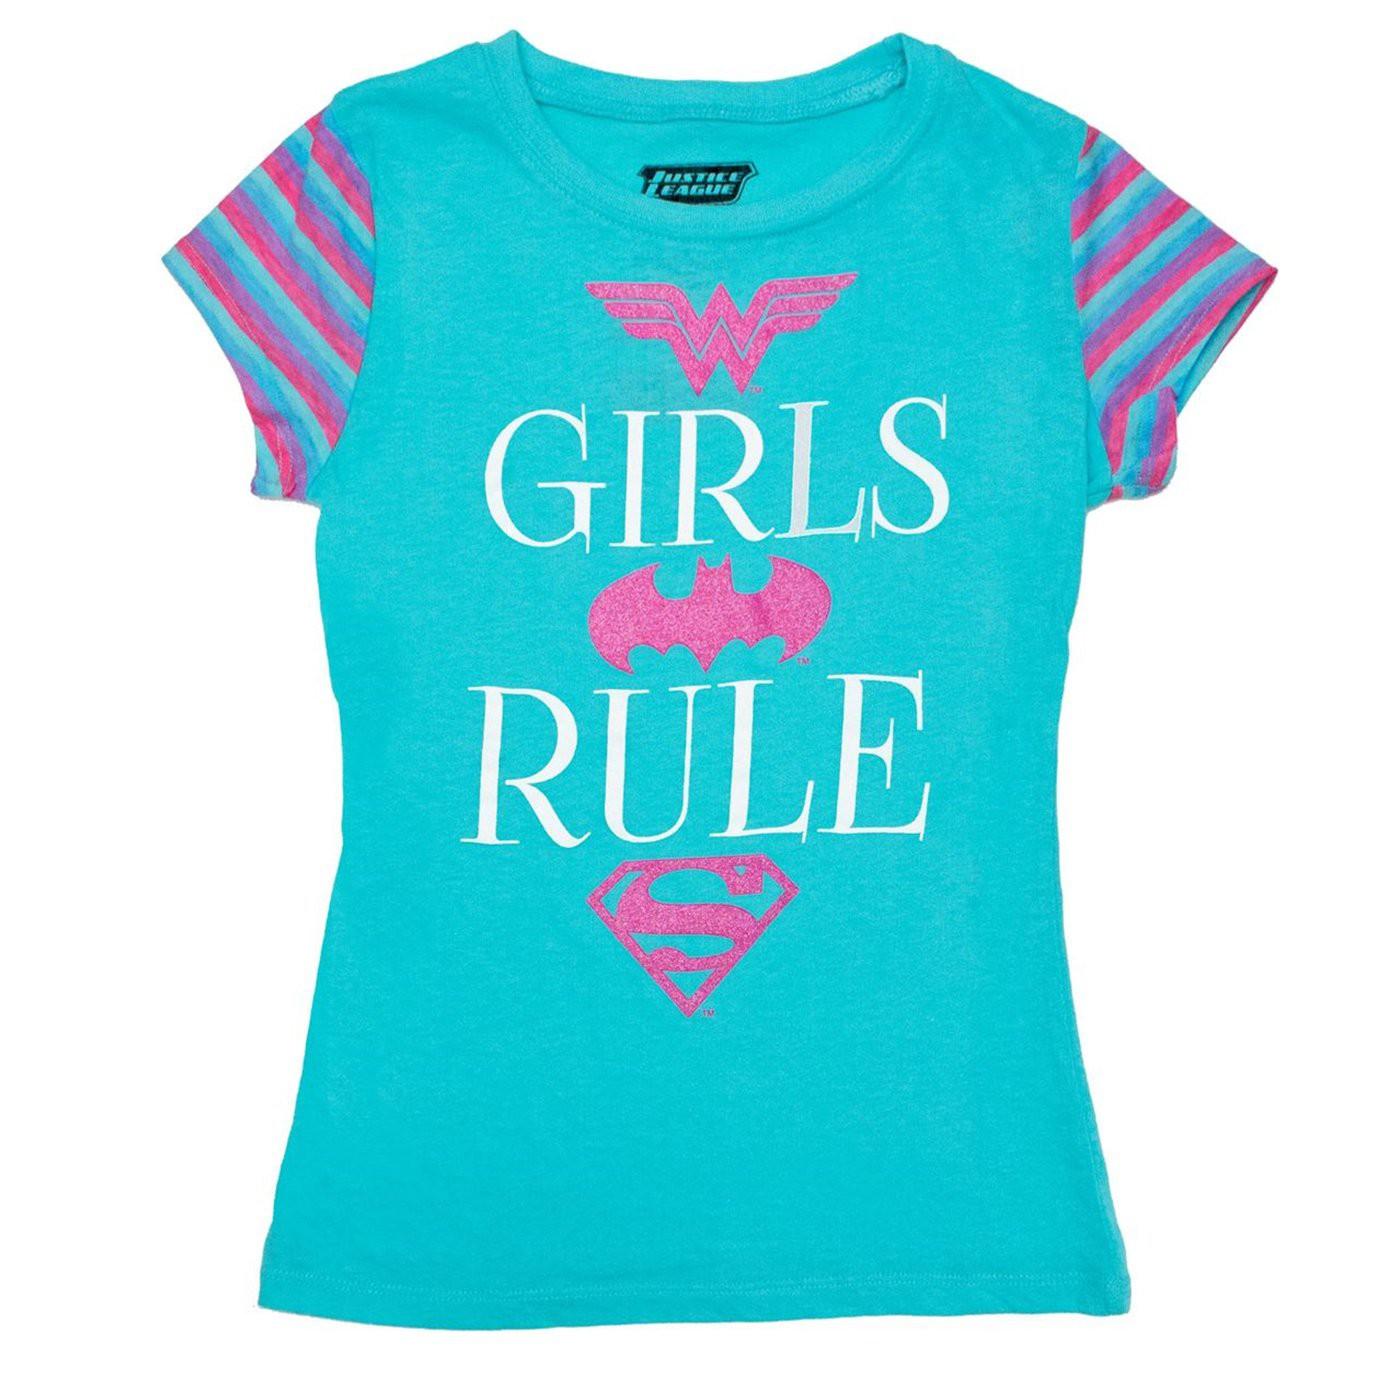 Girls Rule DC Symbols Girl's T-shirt